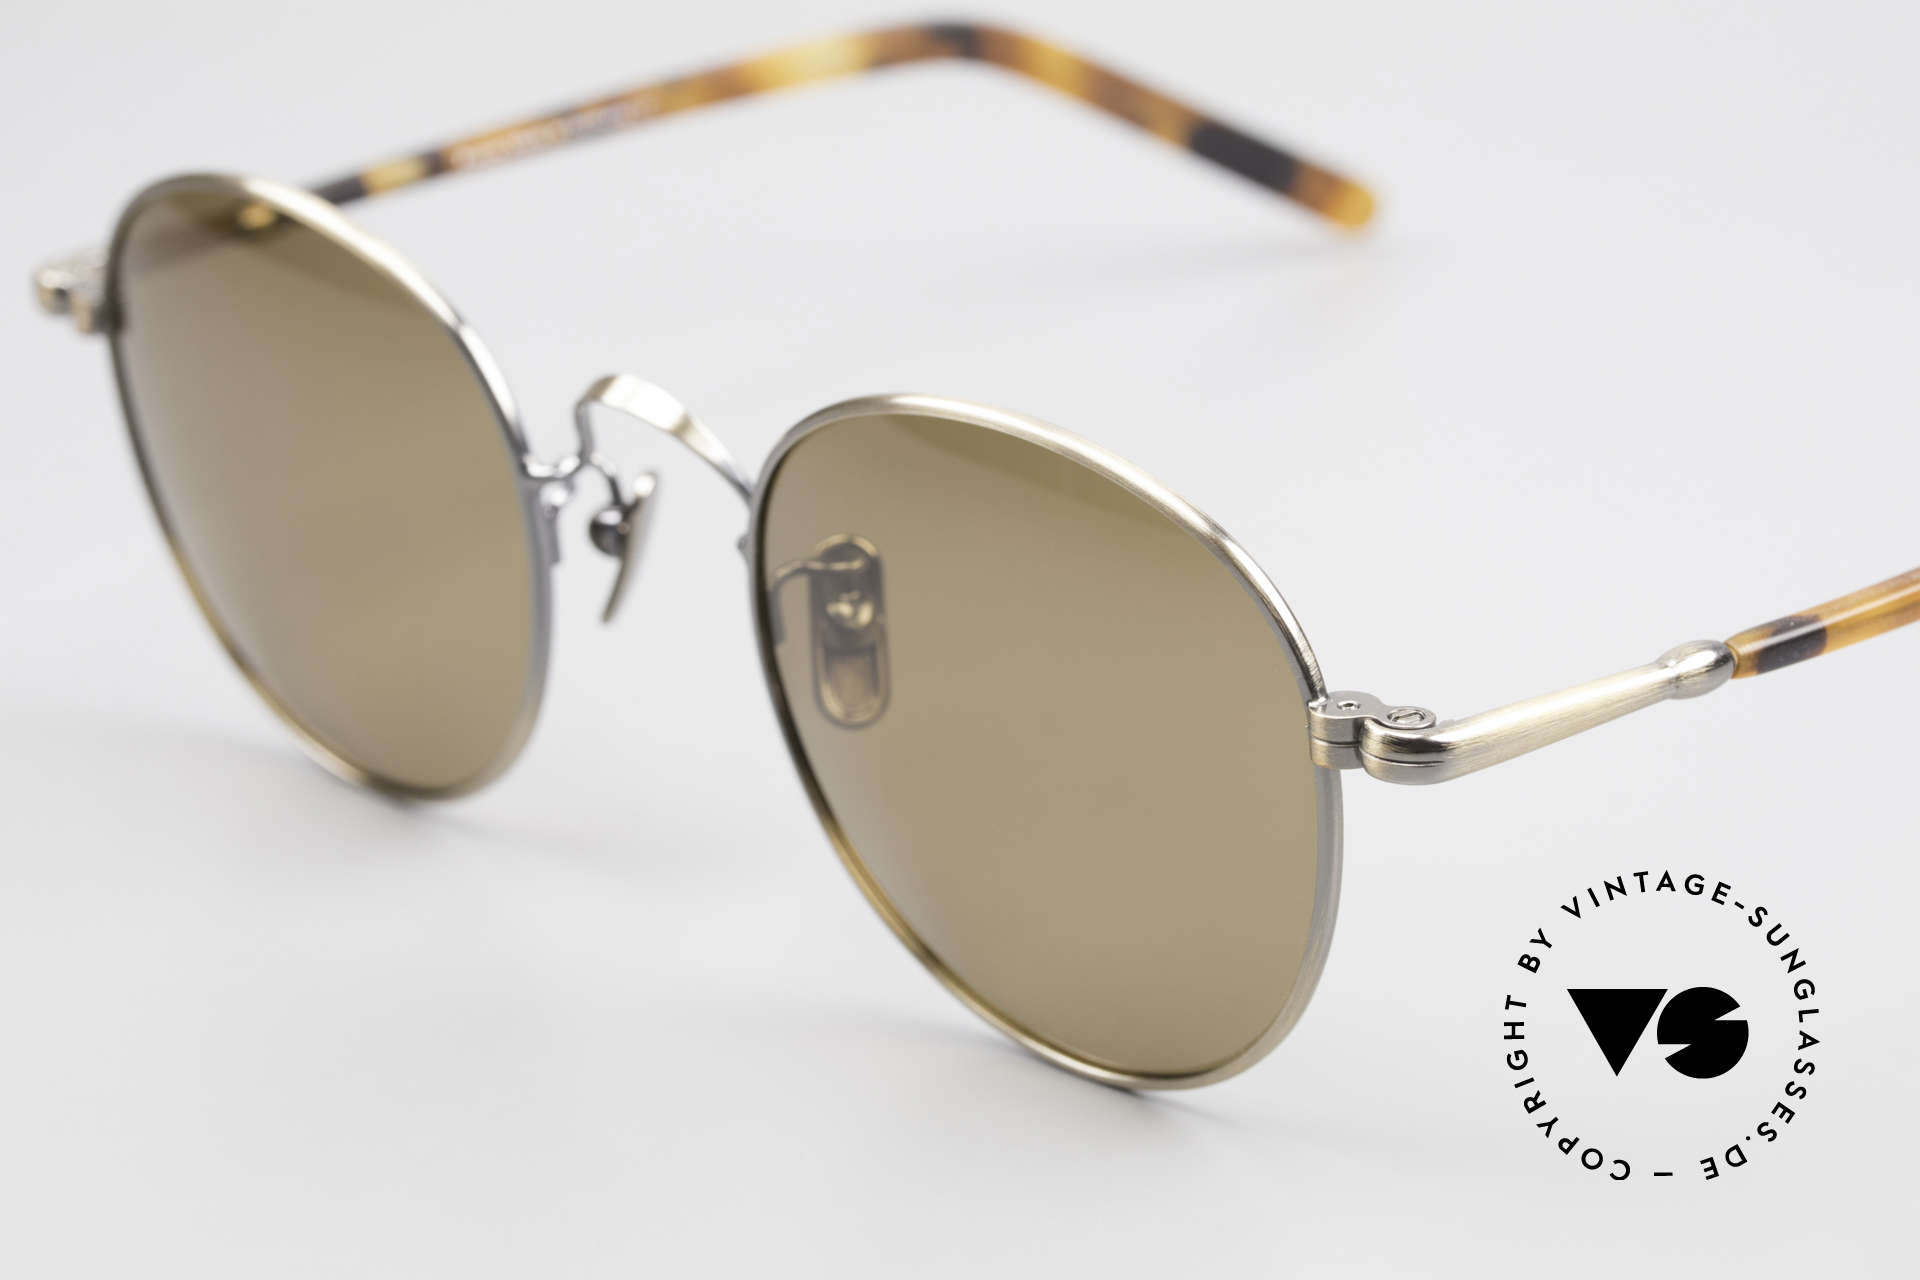 Lunor VA 111 Polarized Panto Sunglasses, with POLARIZED brown sun lenses: 100% UV protection, Made for Men